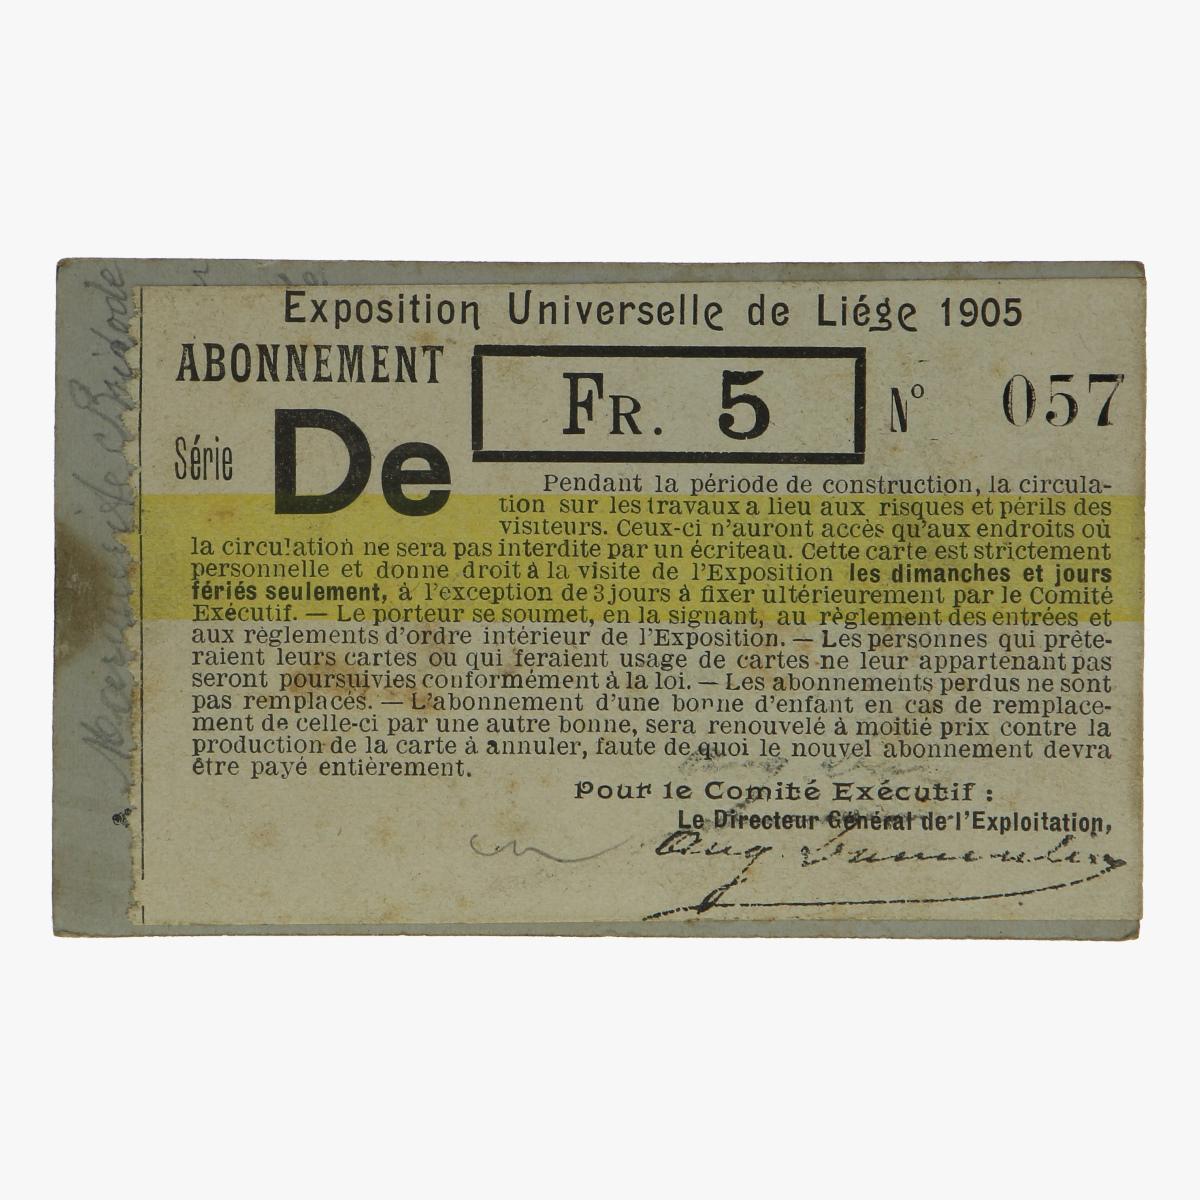 Afbeeldingen van expostition de universelle de liége 1905 abonnement